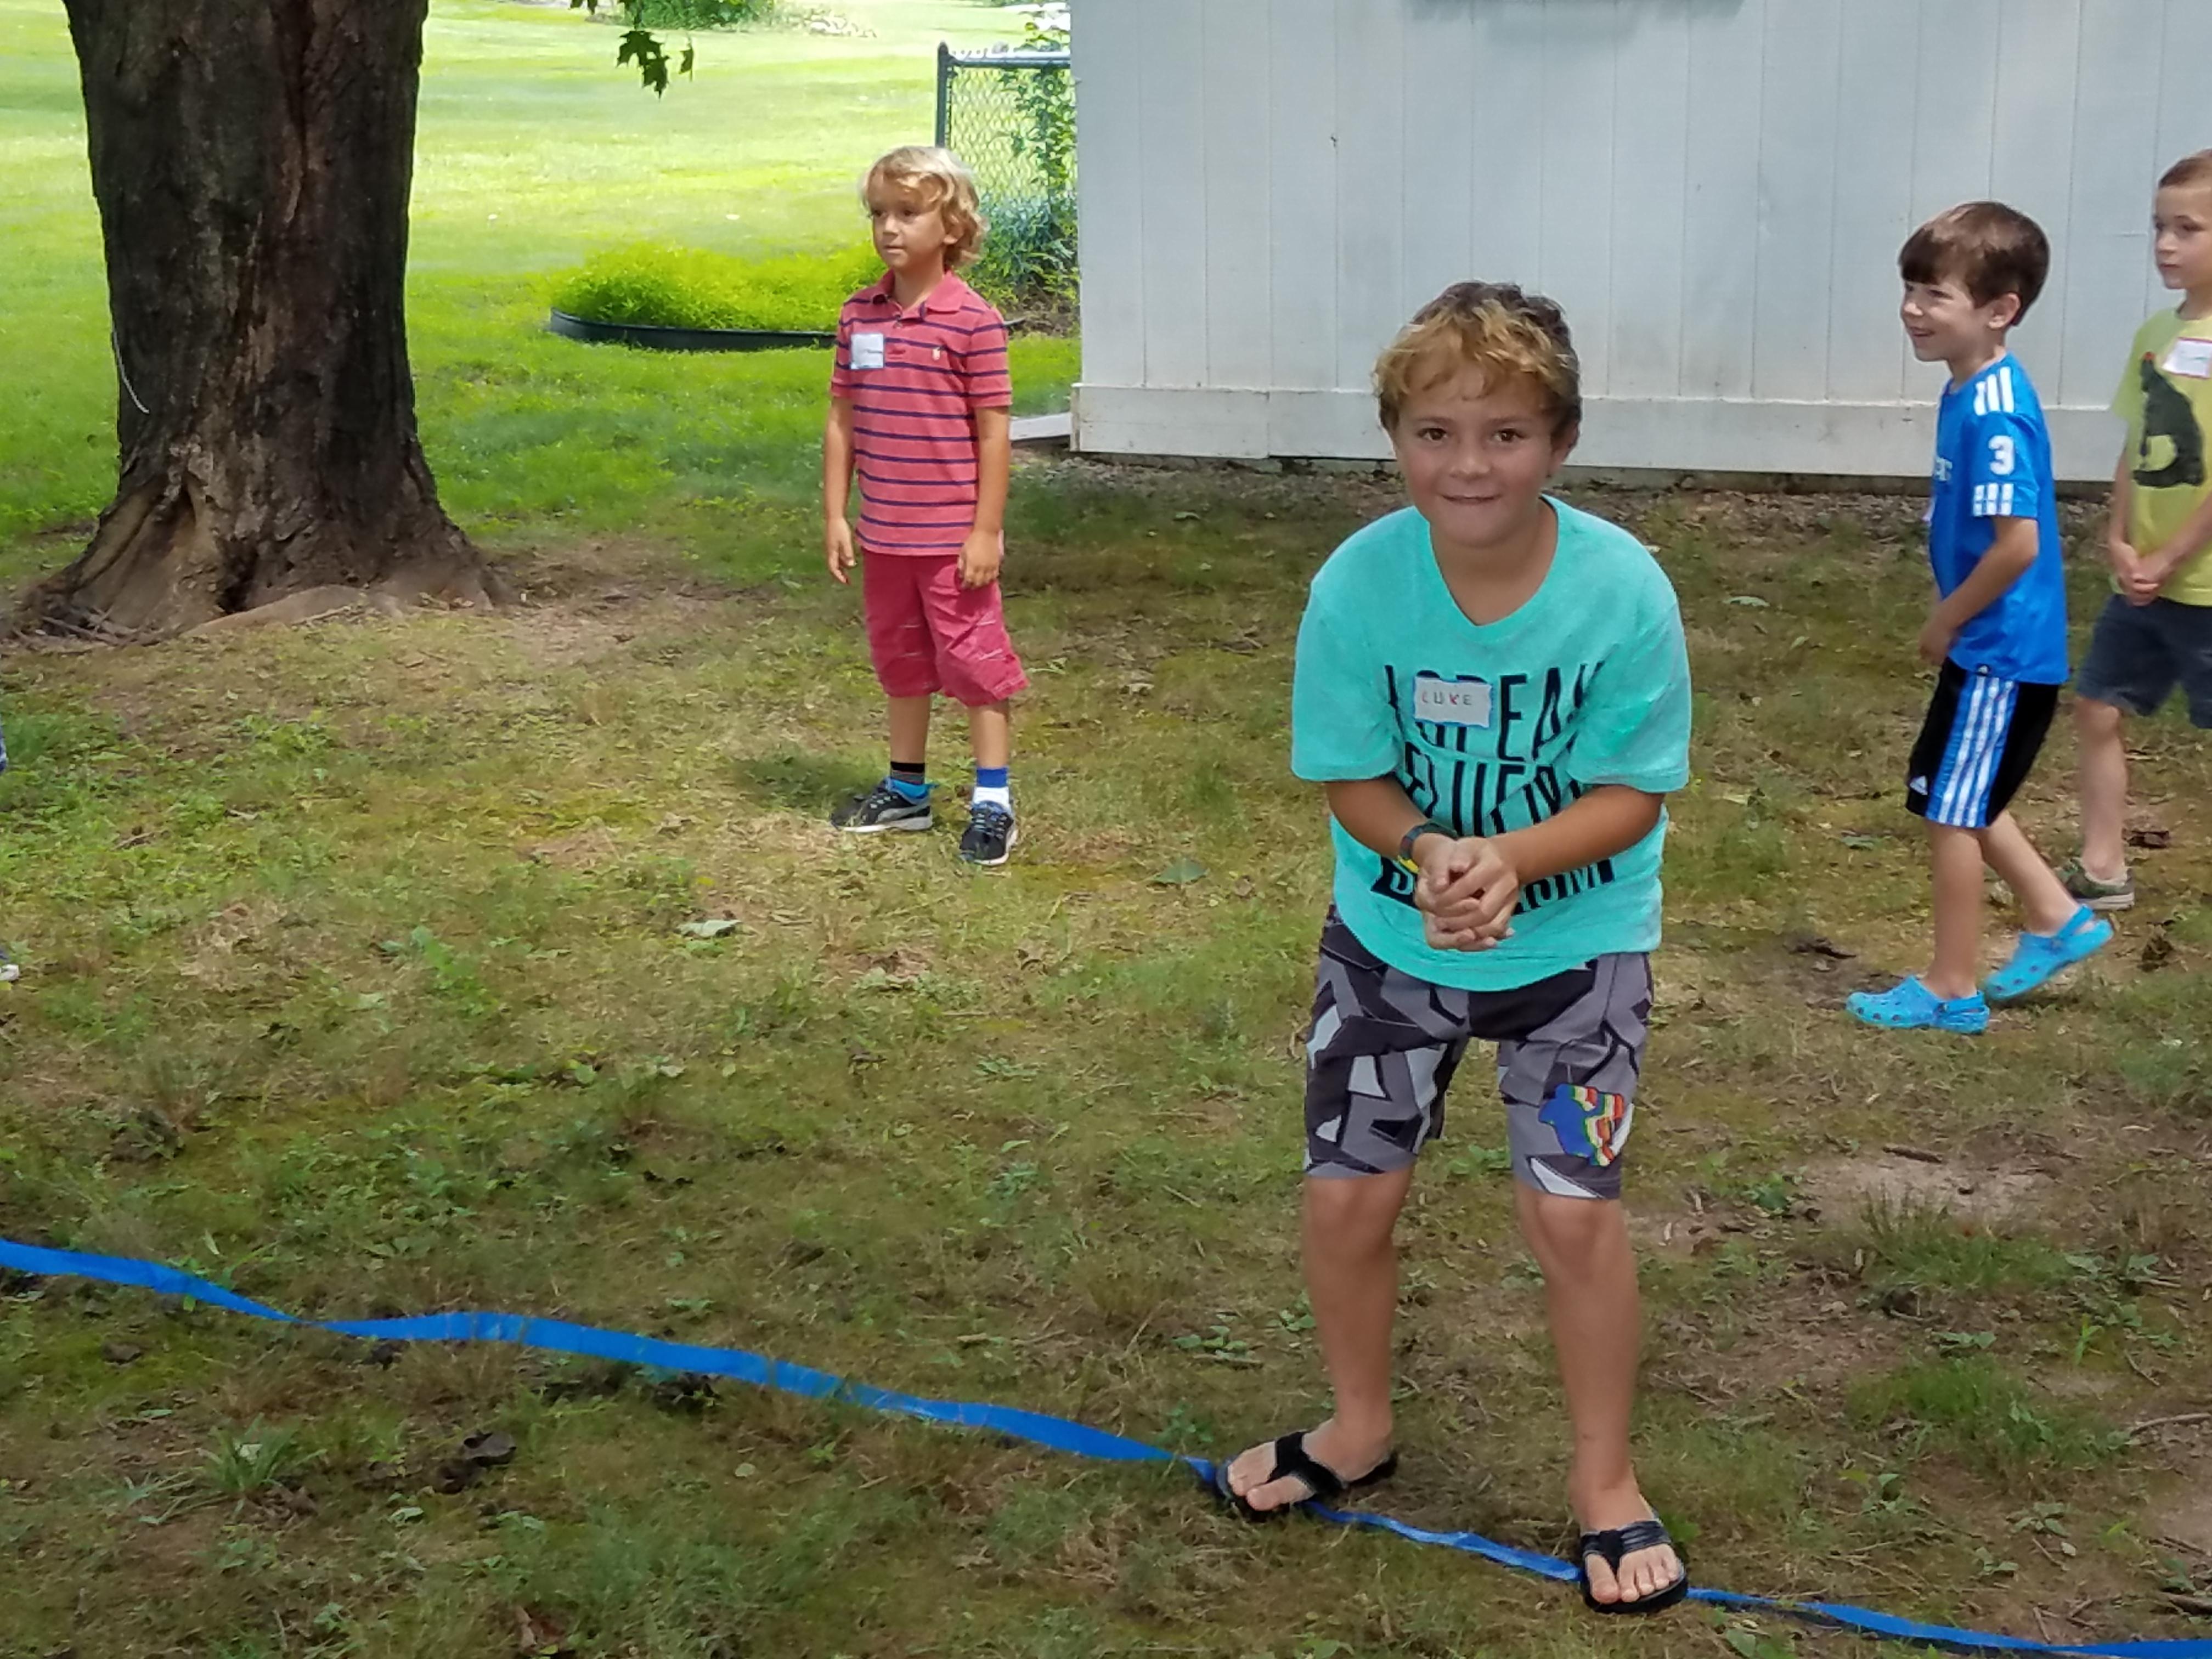 KidsCampAug11